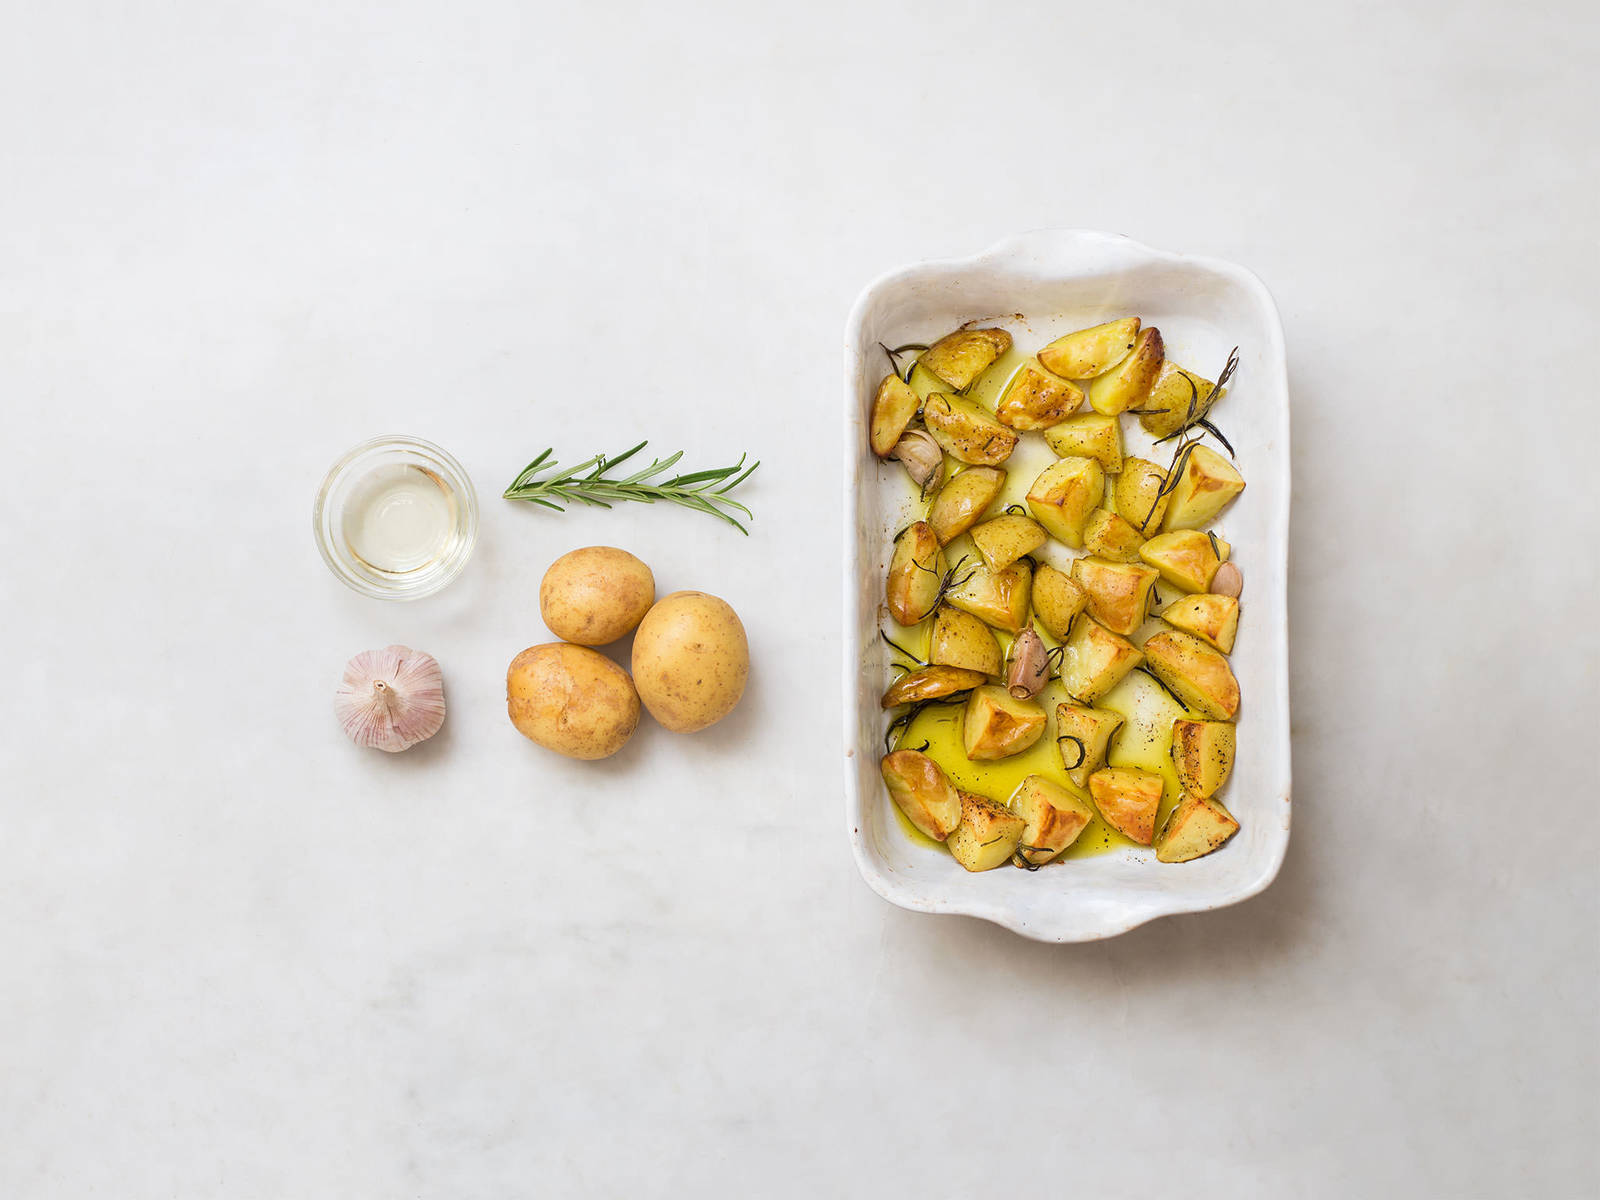 Oven-roasted rosemary potatoes